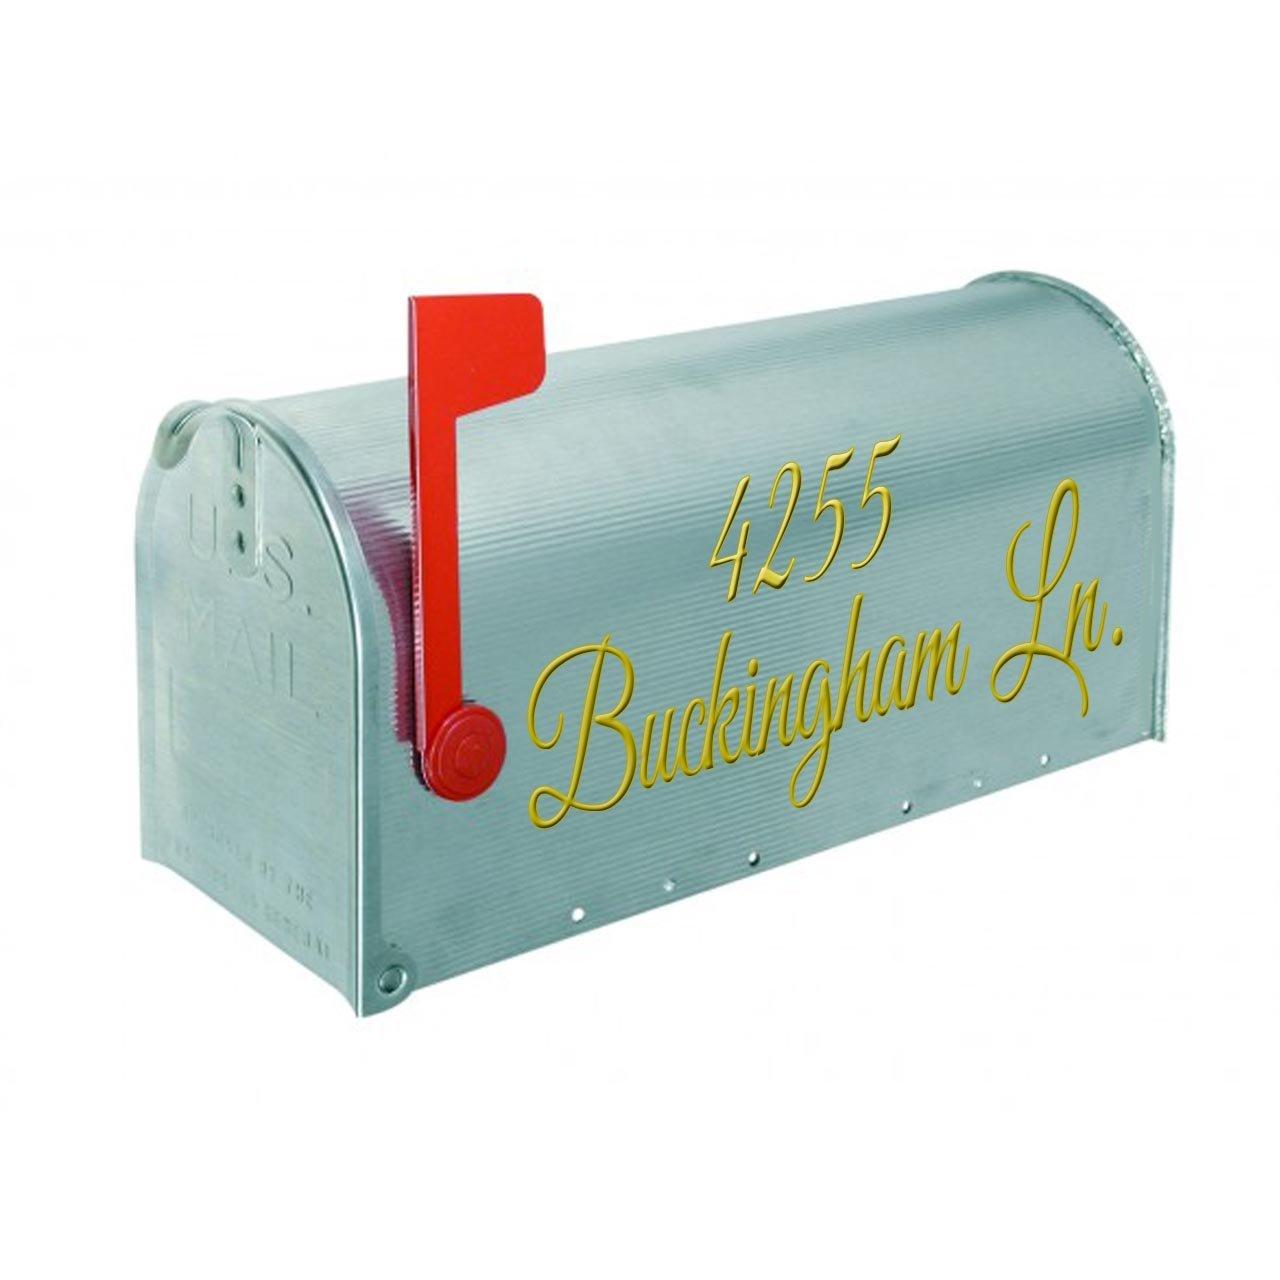 Gold, 19 W X 6.5 H Insert Street Name /& Address Personalized Decals CMB7 VWAQ Mailbox Address Decal Set of 2